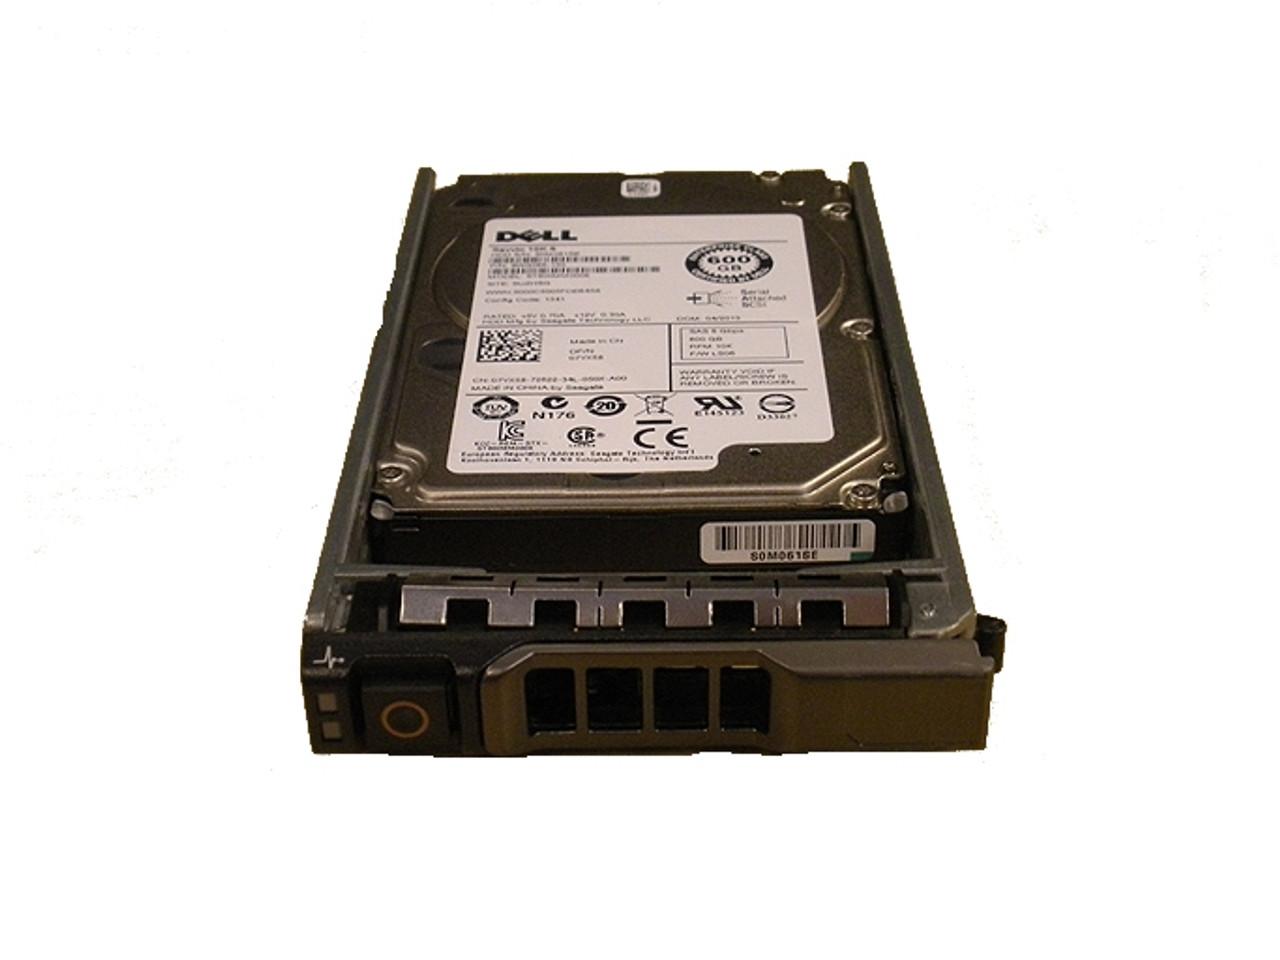 Dell PowerEdge T320 Hot Swap 600GB 10K SAS Hard Drive 1 Year Warranty